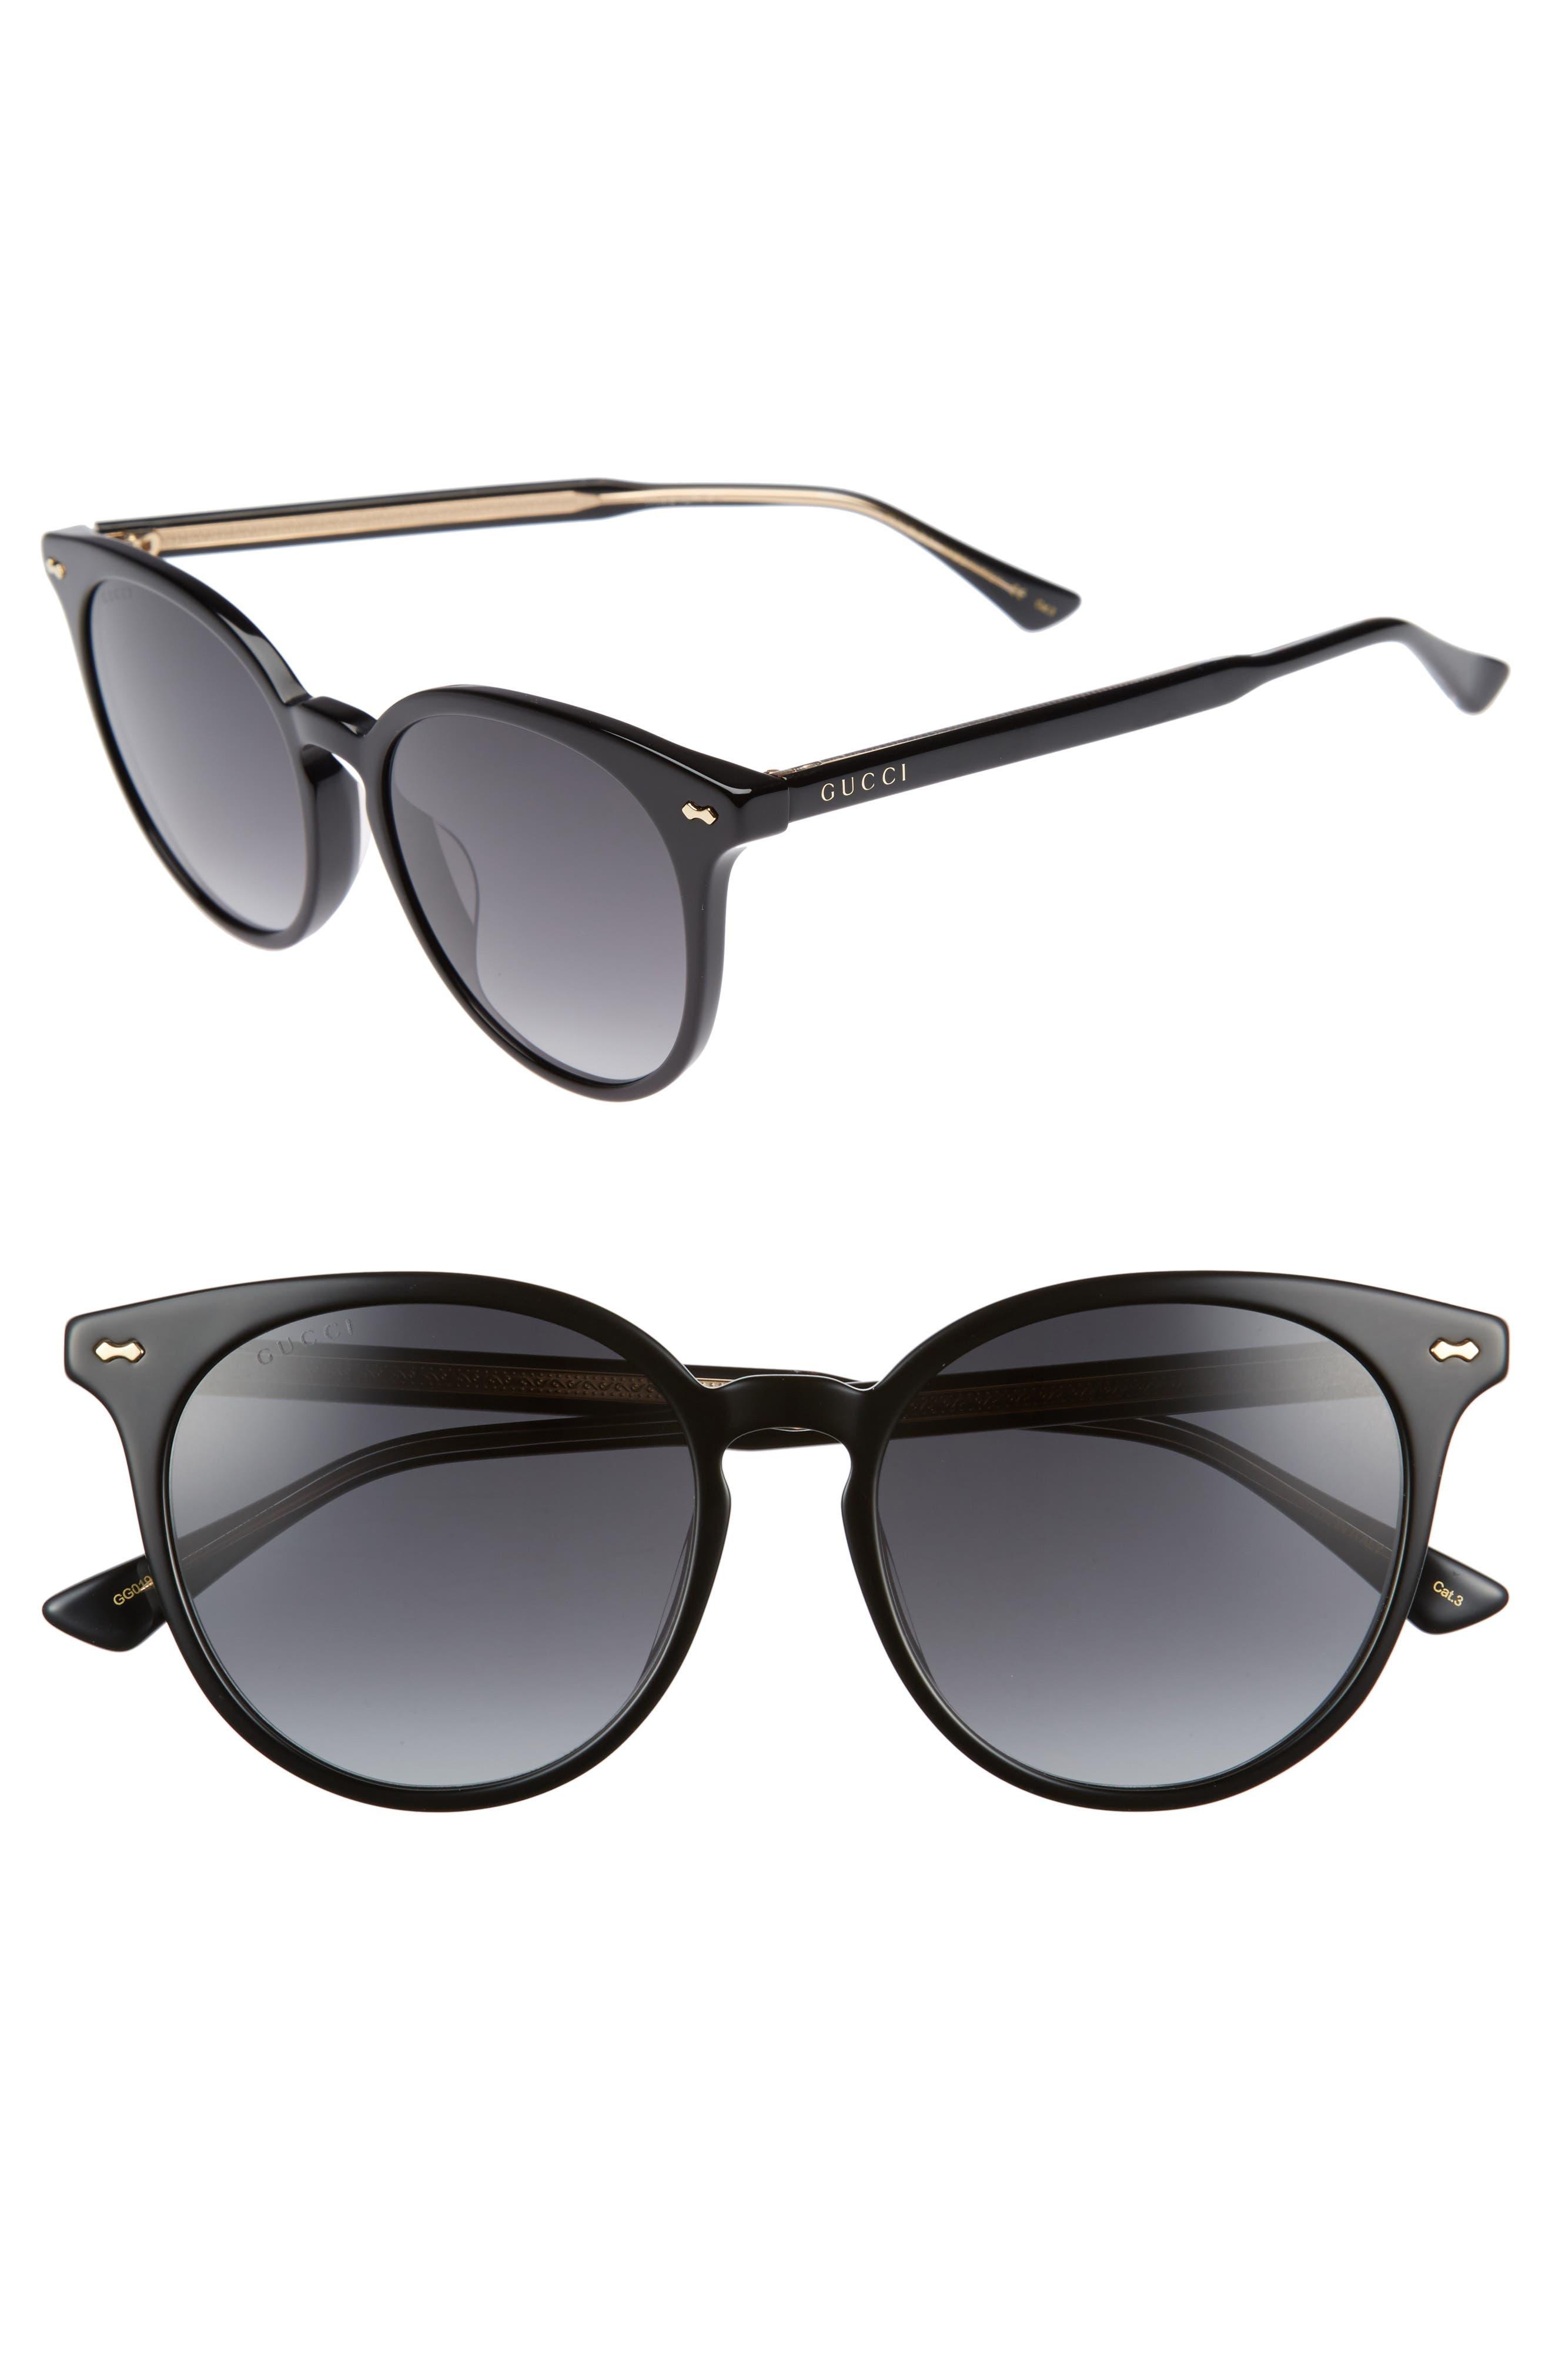 55mm Round Cat Eye Sunglasses,                         Main,                         color, Black